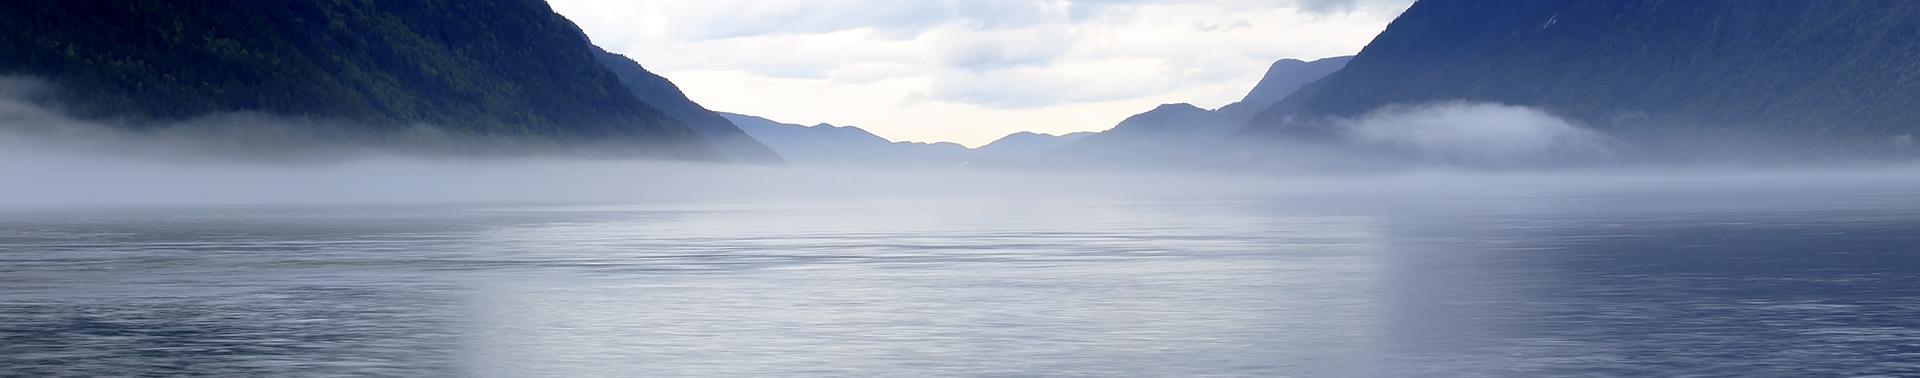 Song lyrics - Mist over ocean between mountains